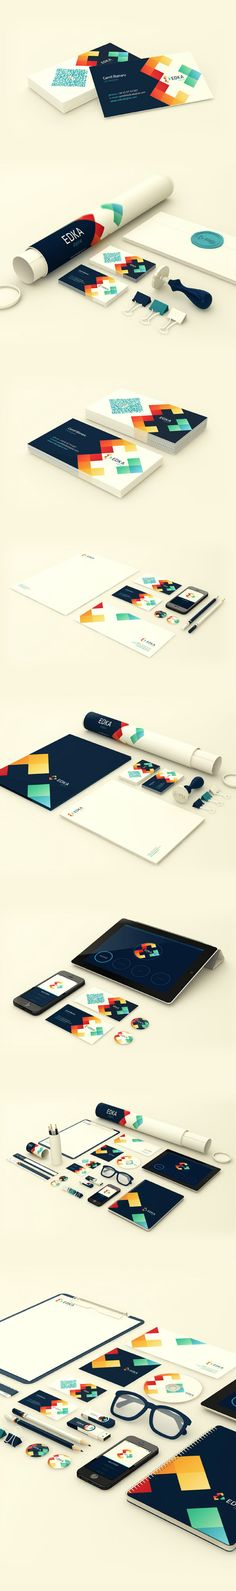 Unique Branding Design, Edka Digital #Branding #Design (http://www.pinterest.com/aldenchong/)